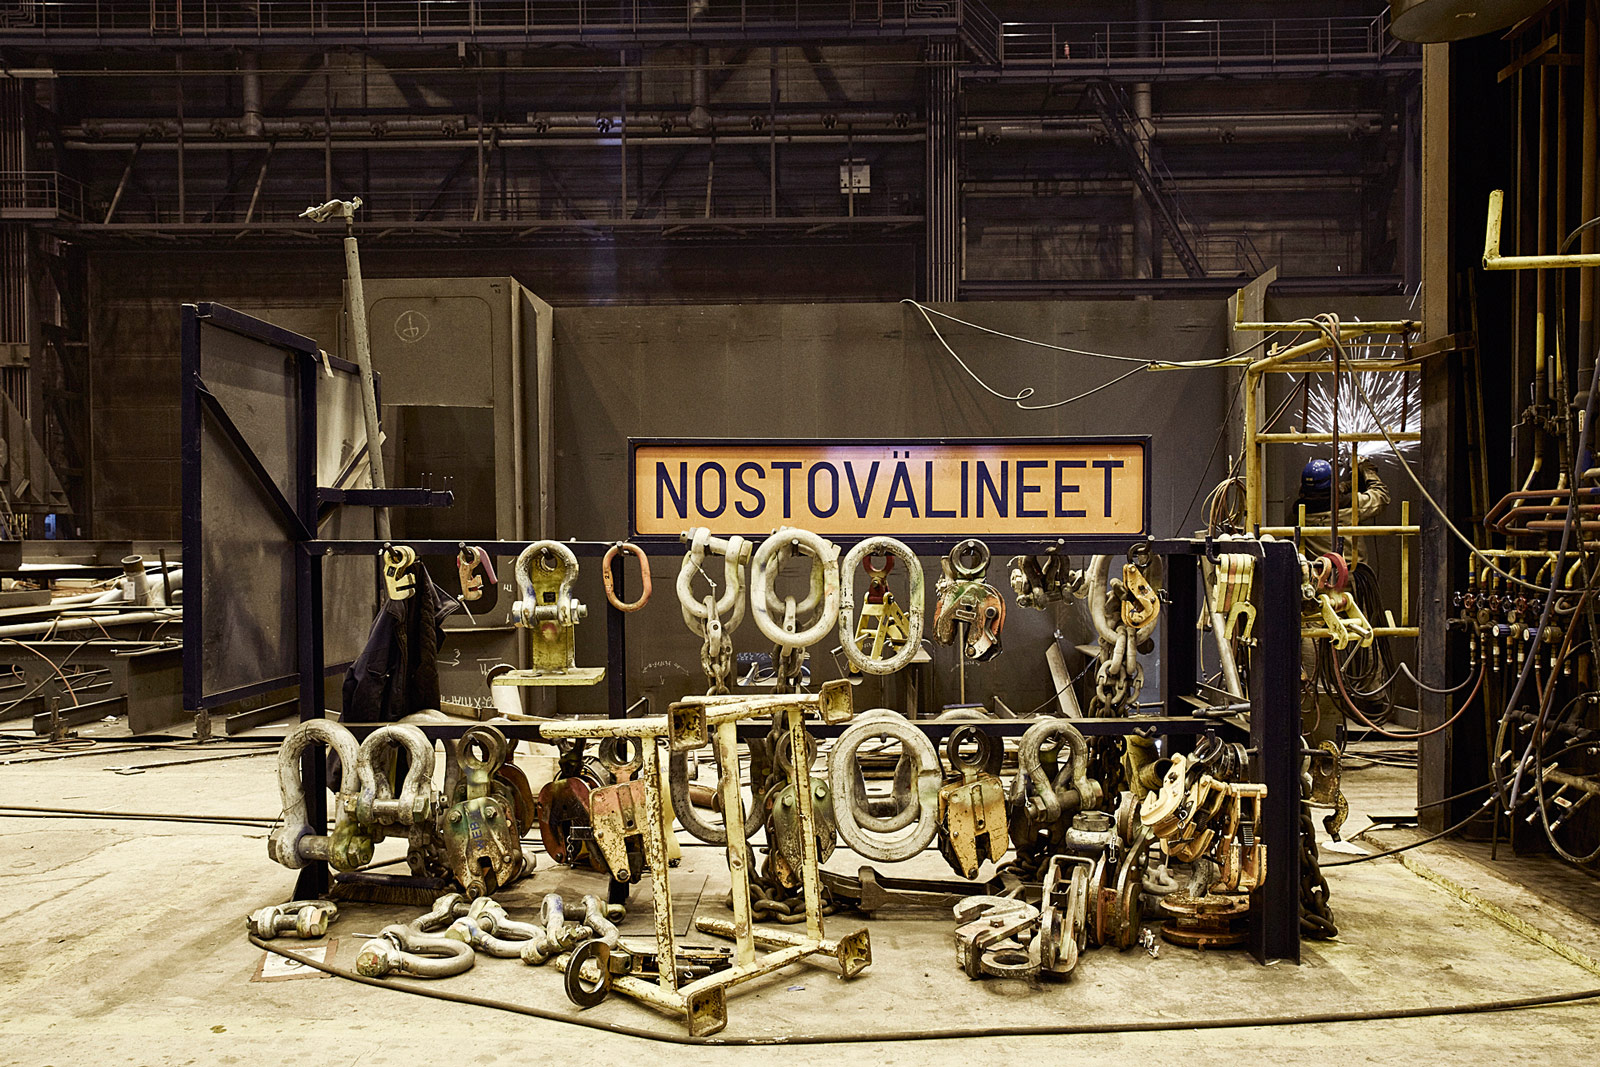 finnisch:Transportmaterial